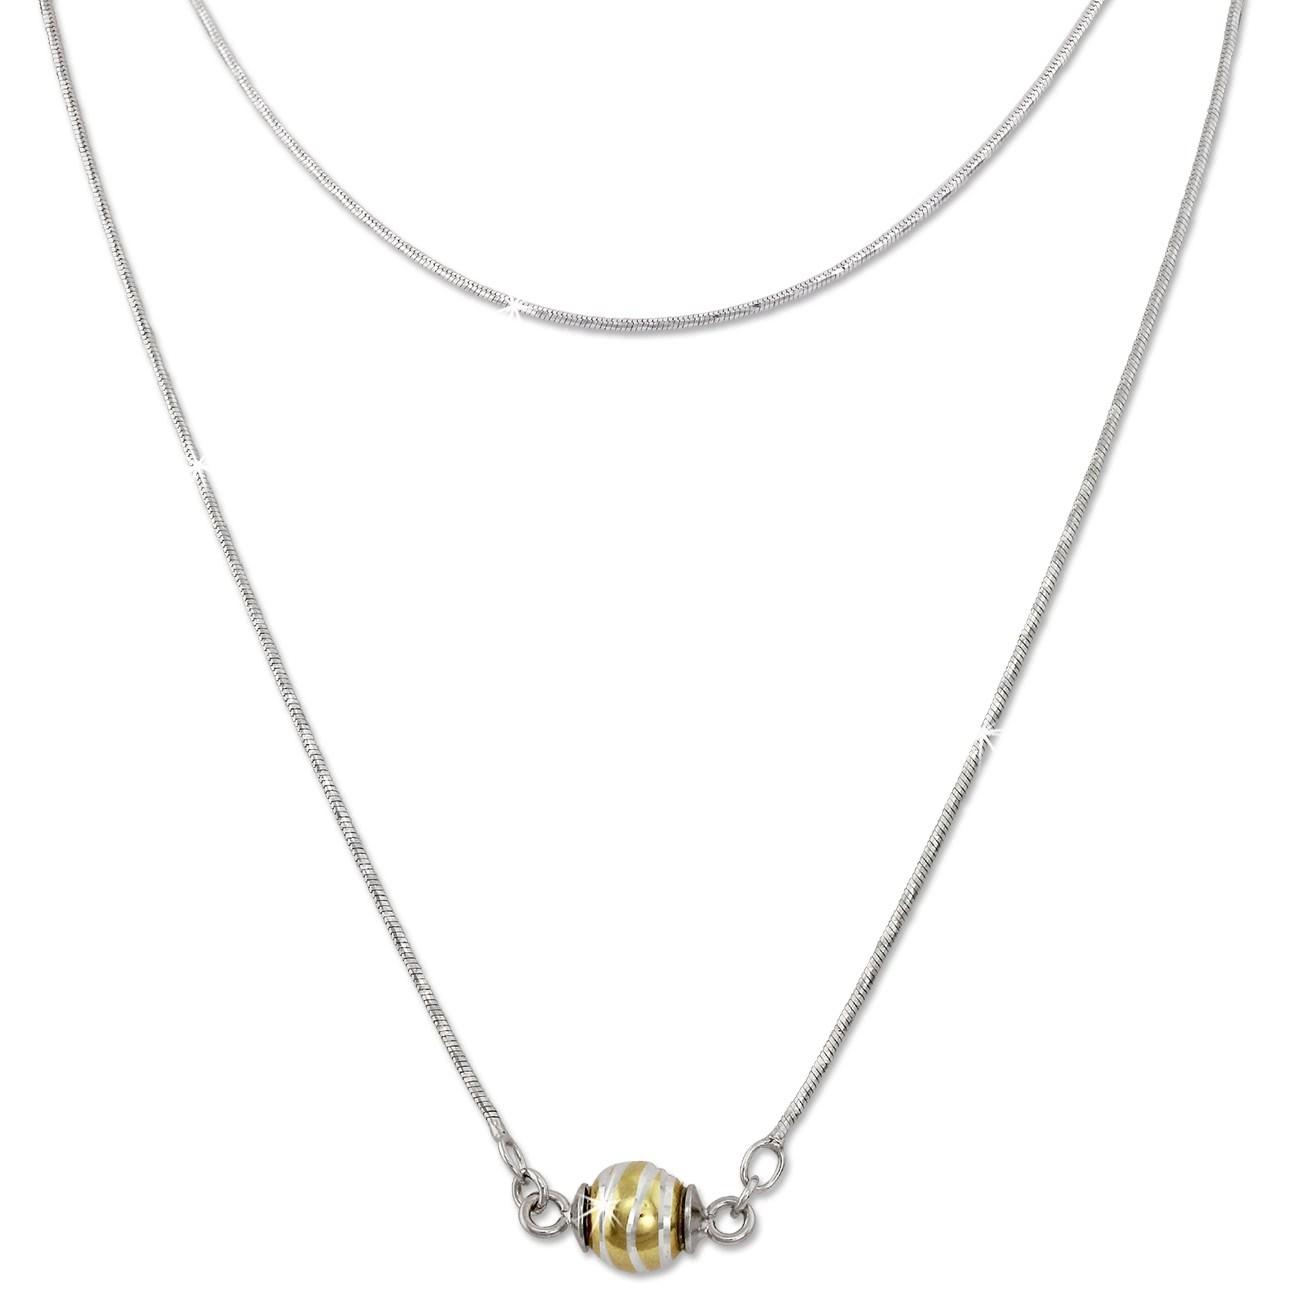 SilberDream Collier Kette Kugel Welle vergoldet 925 Silber Damen 45cm SDK24345Y